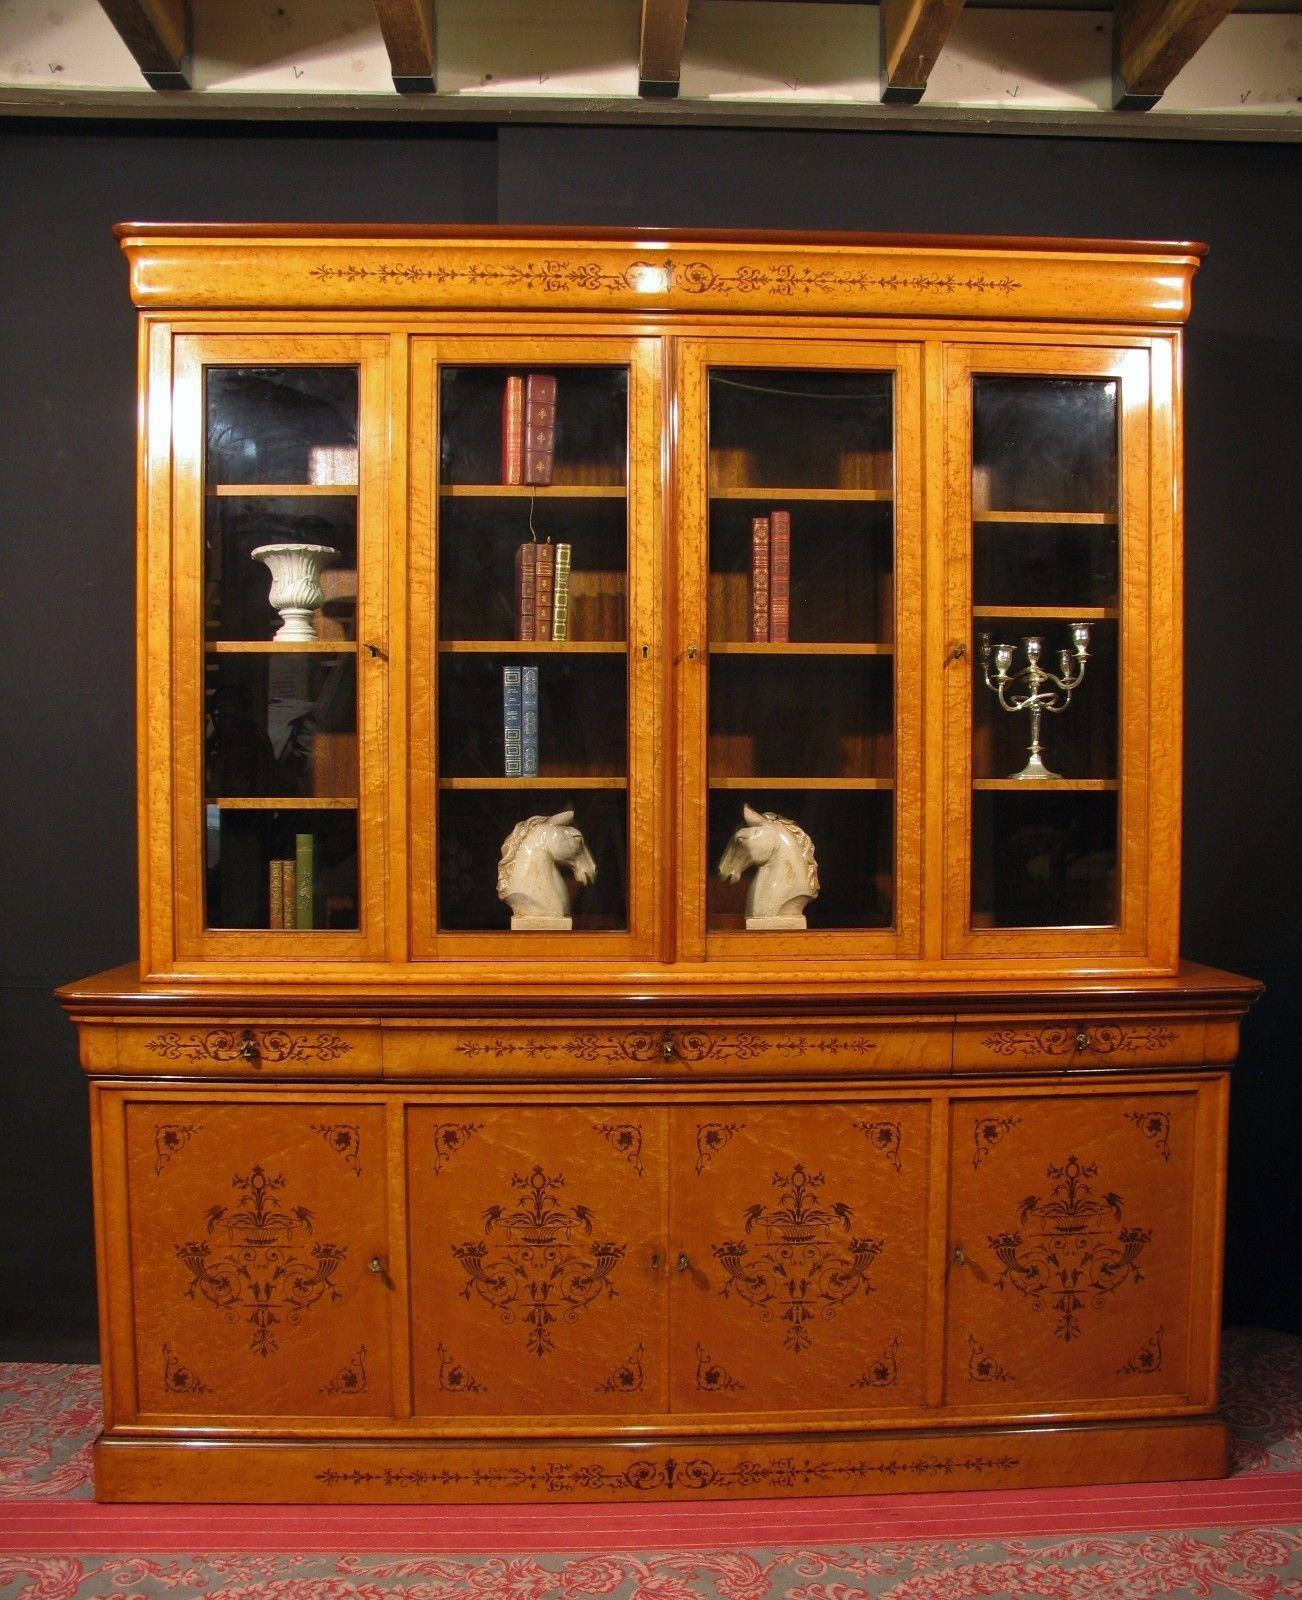 grande bibliothque charles x meuble 2 corps vitrine buffet enfilade fiel for sale eur 450000 see photos superbe bibliothque 2 corps de style